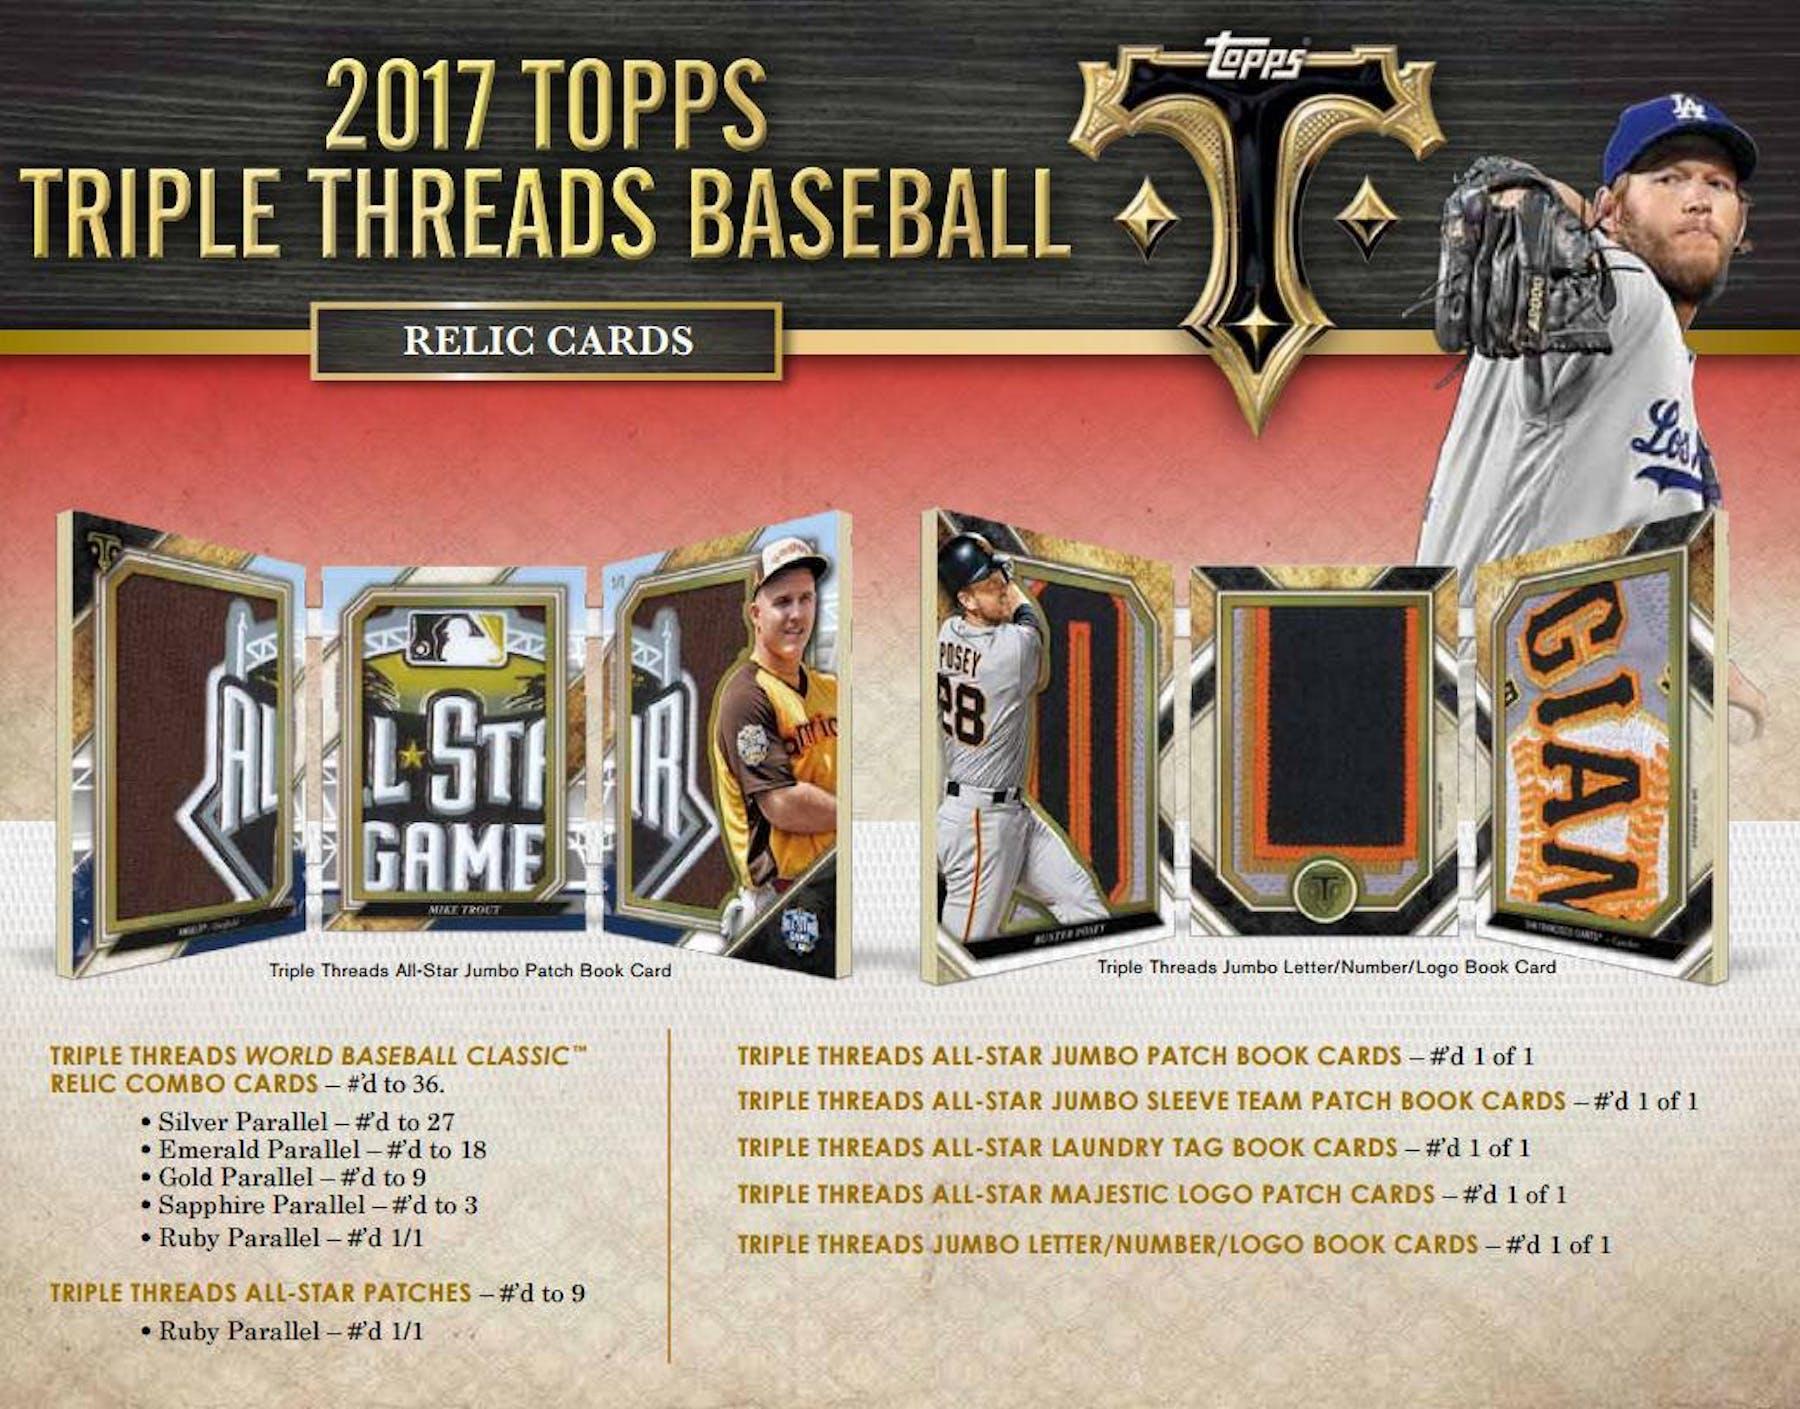 2017 Topps Triple Threads Baseball Hobby Box Da Card World